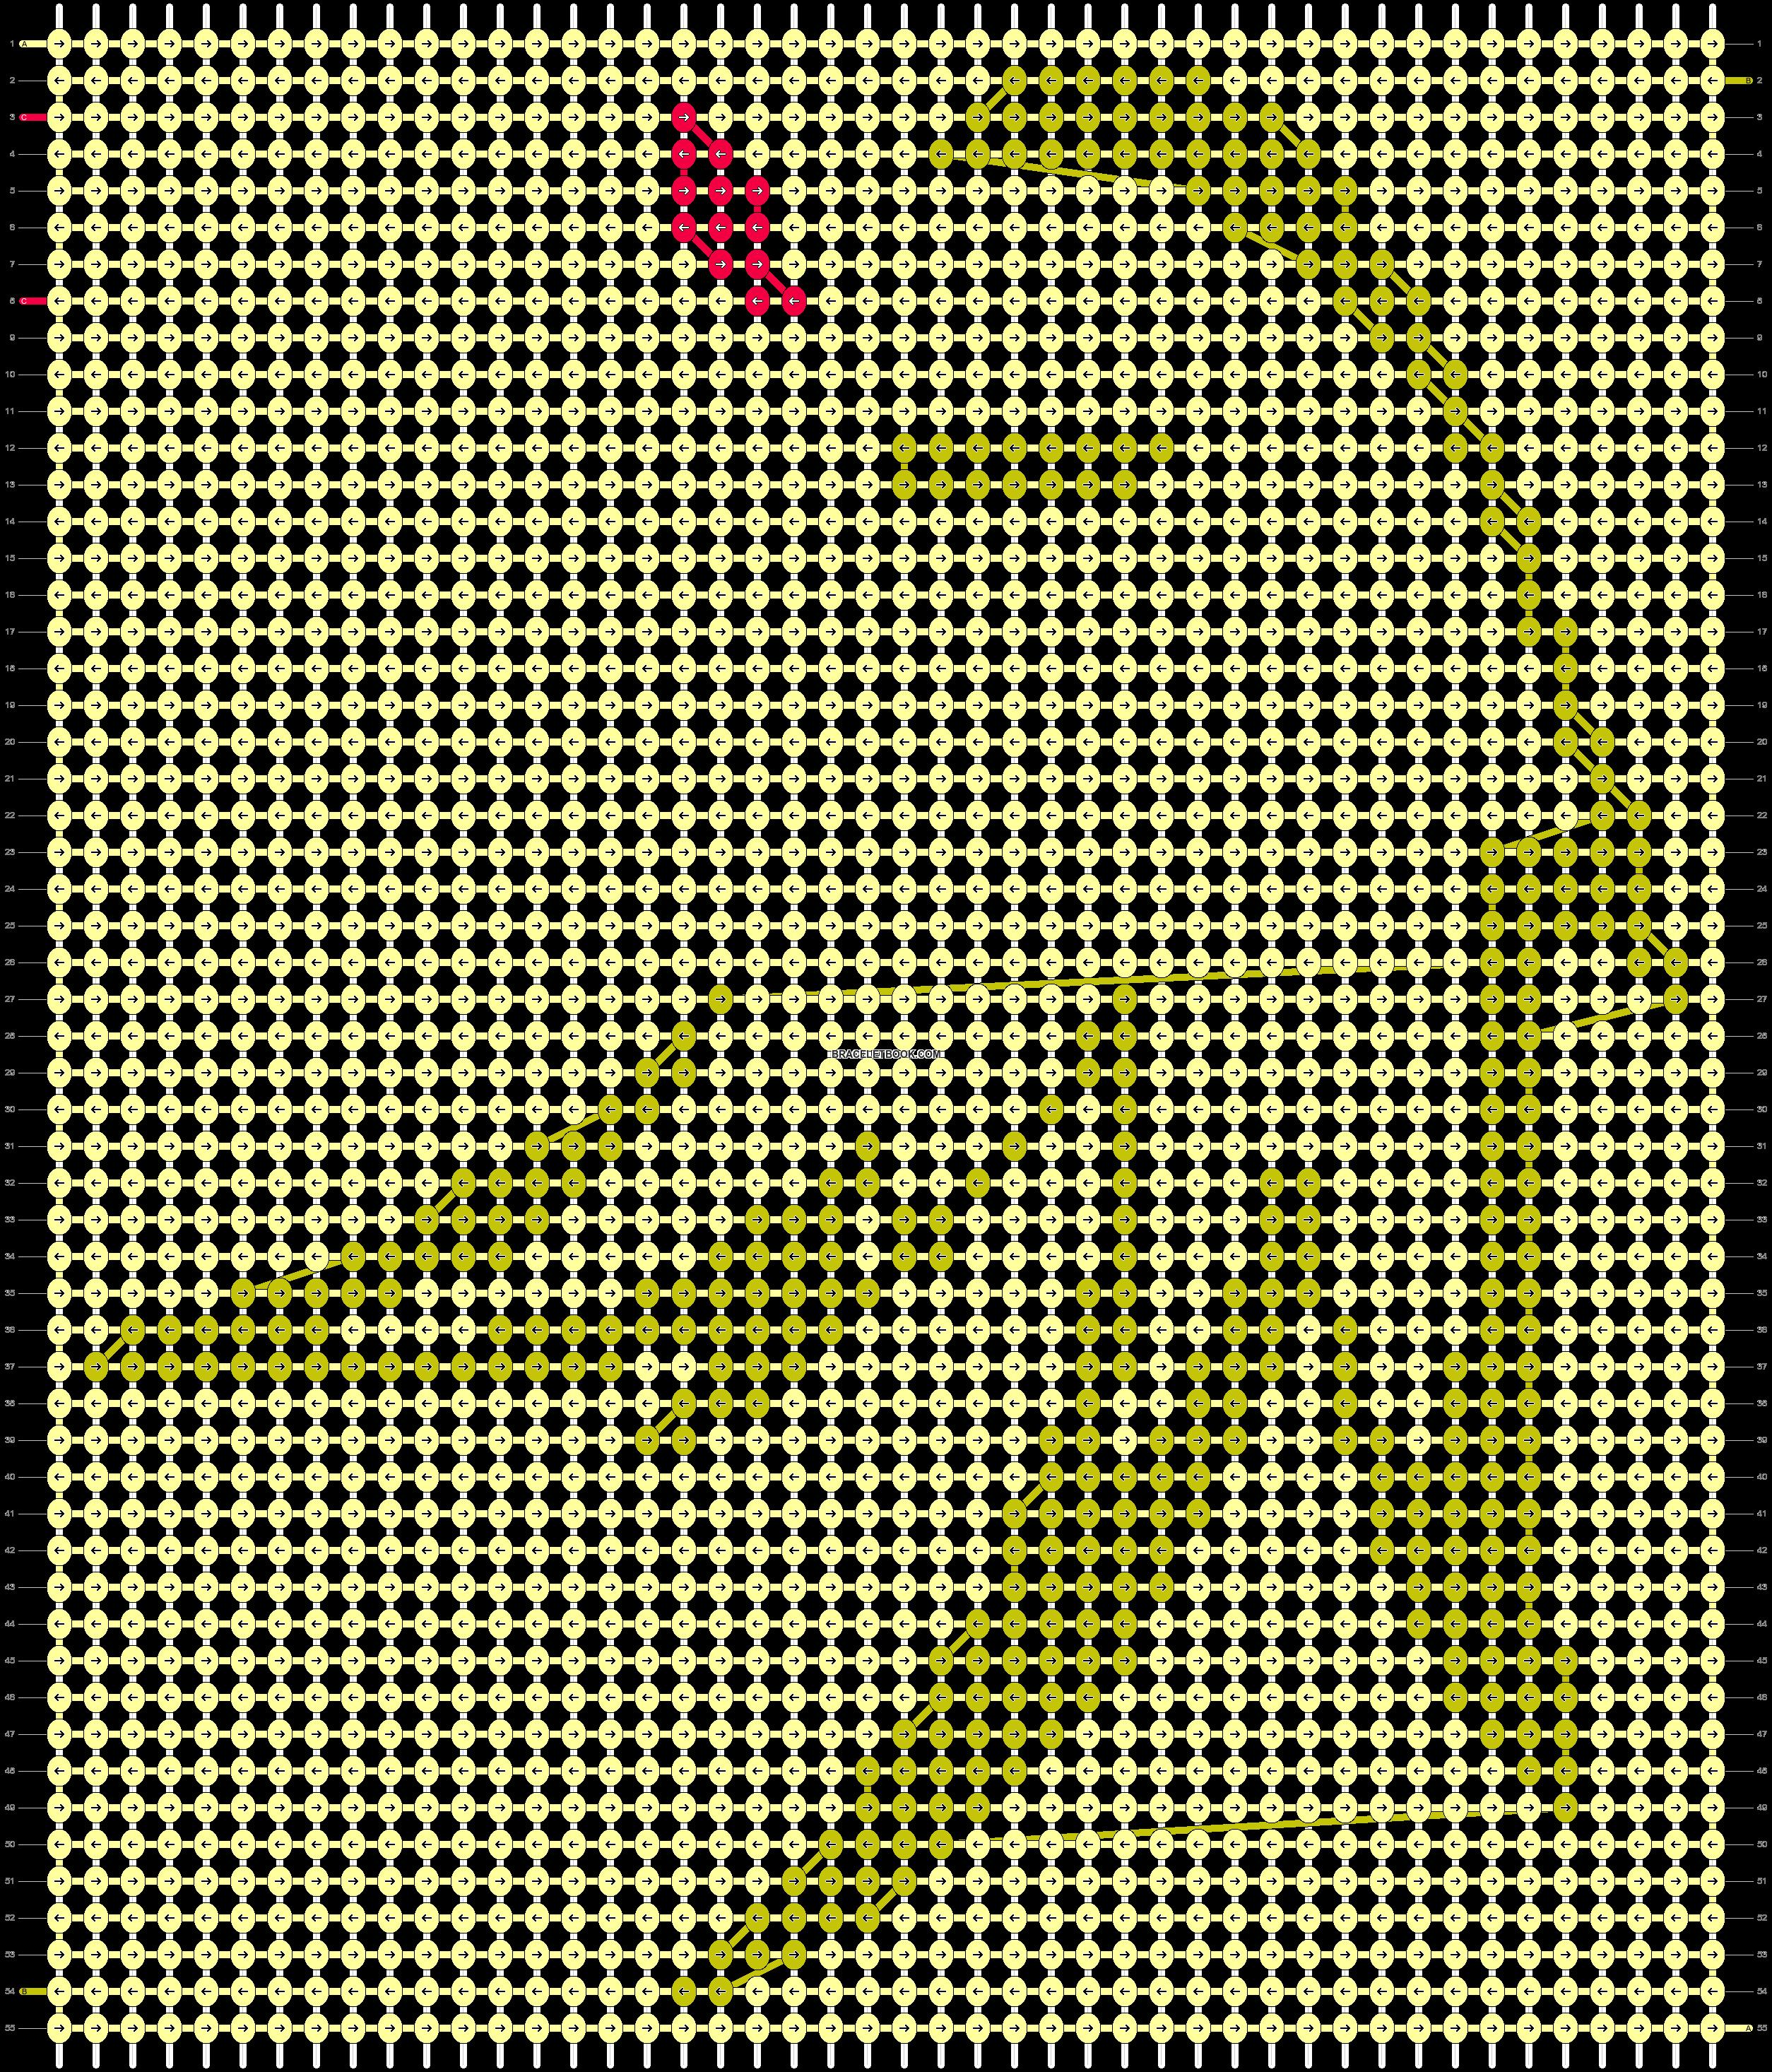 Alpha Pattern #11990 added by lyra2245